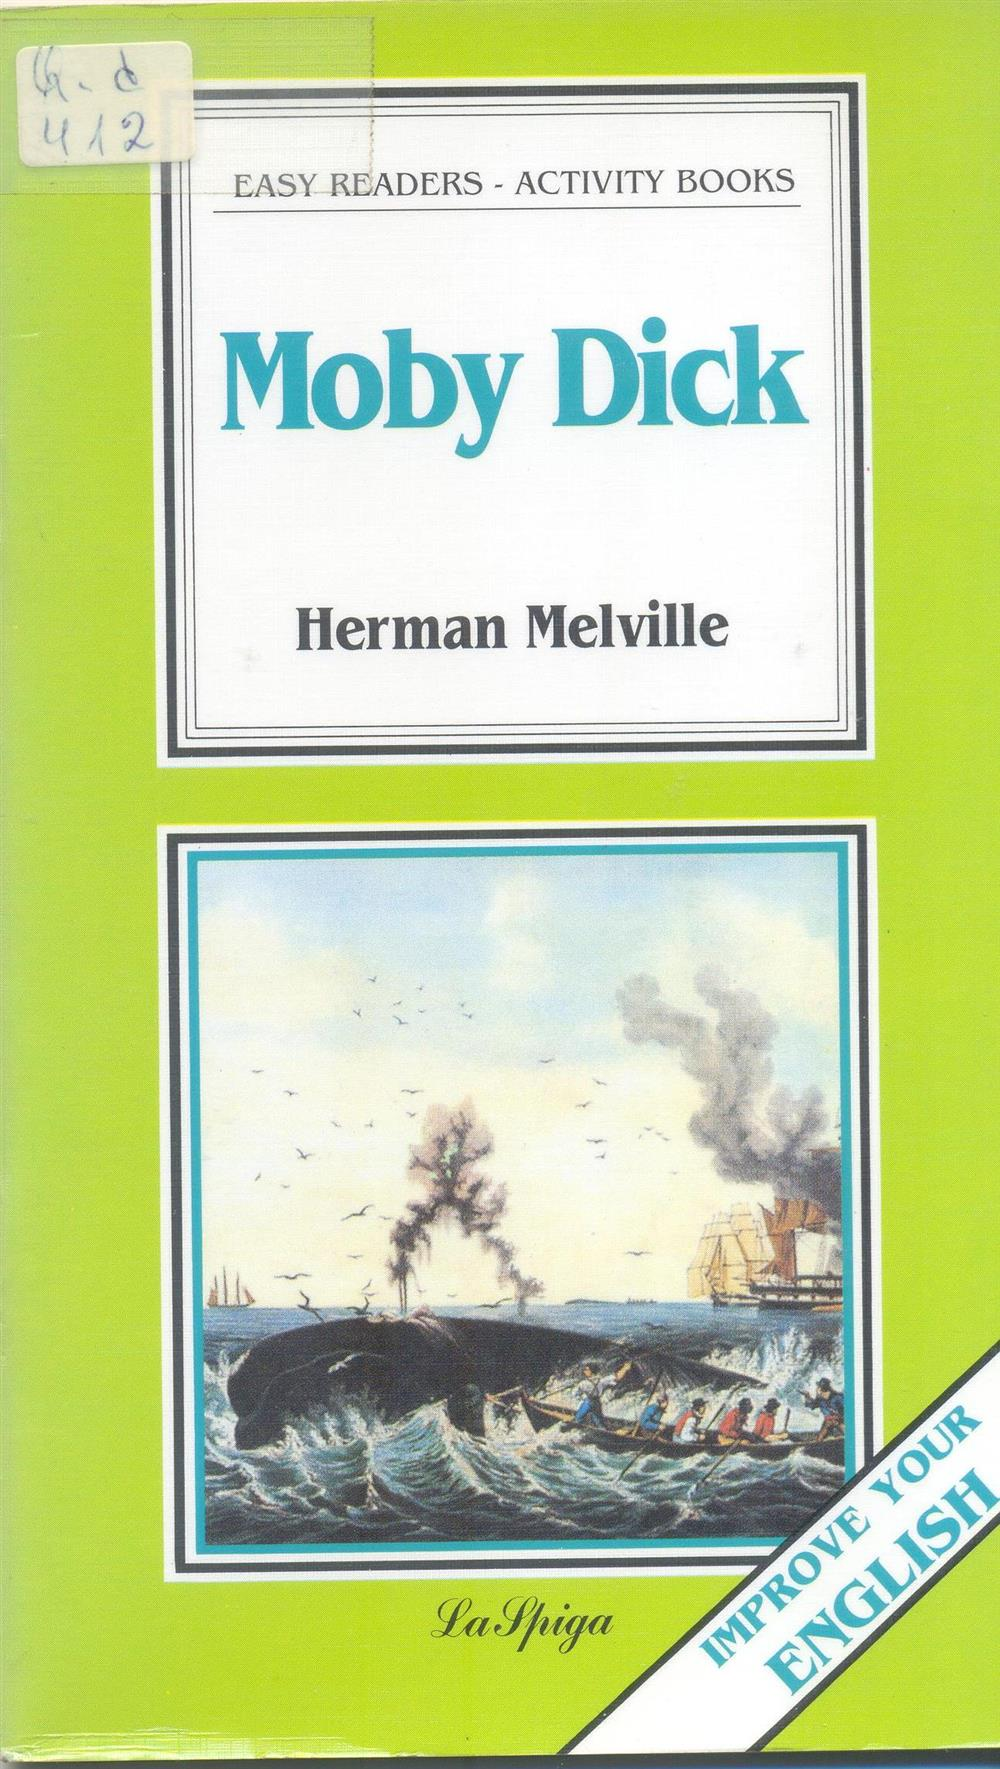 Moby Dick 001.jpg